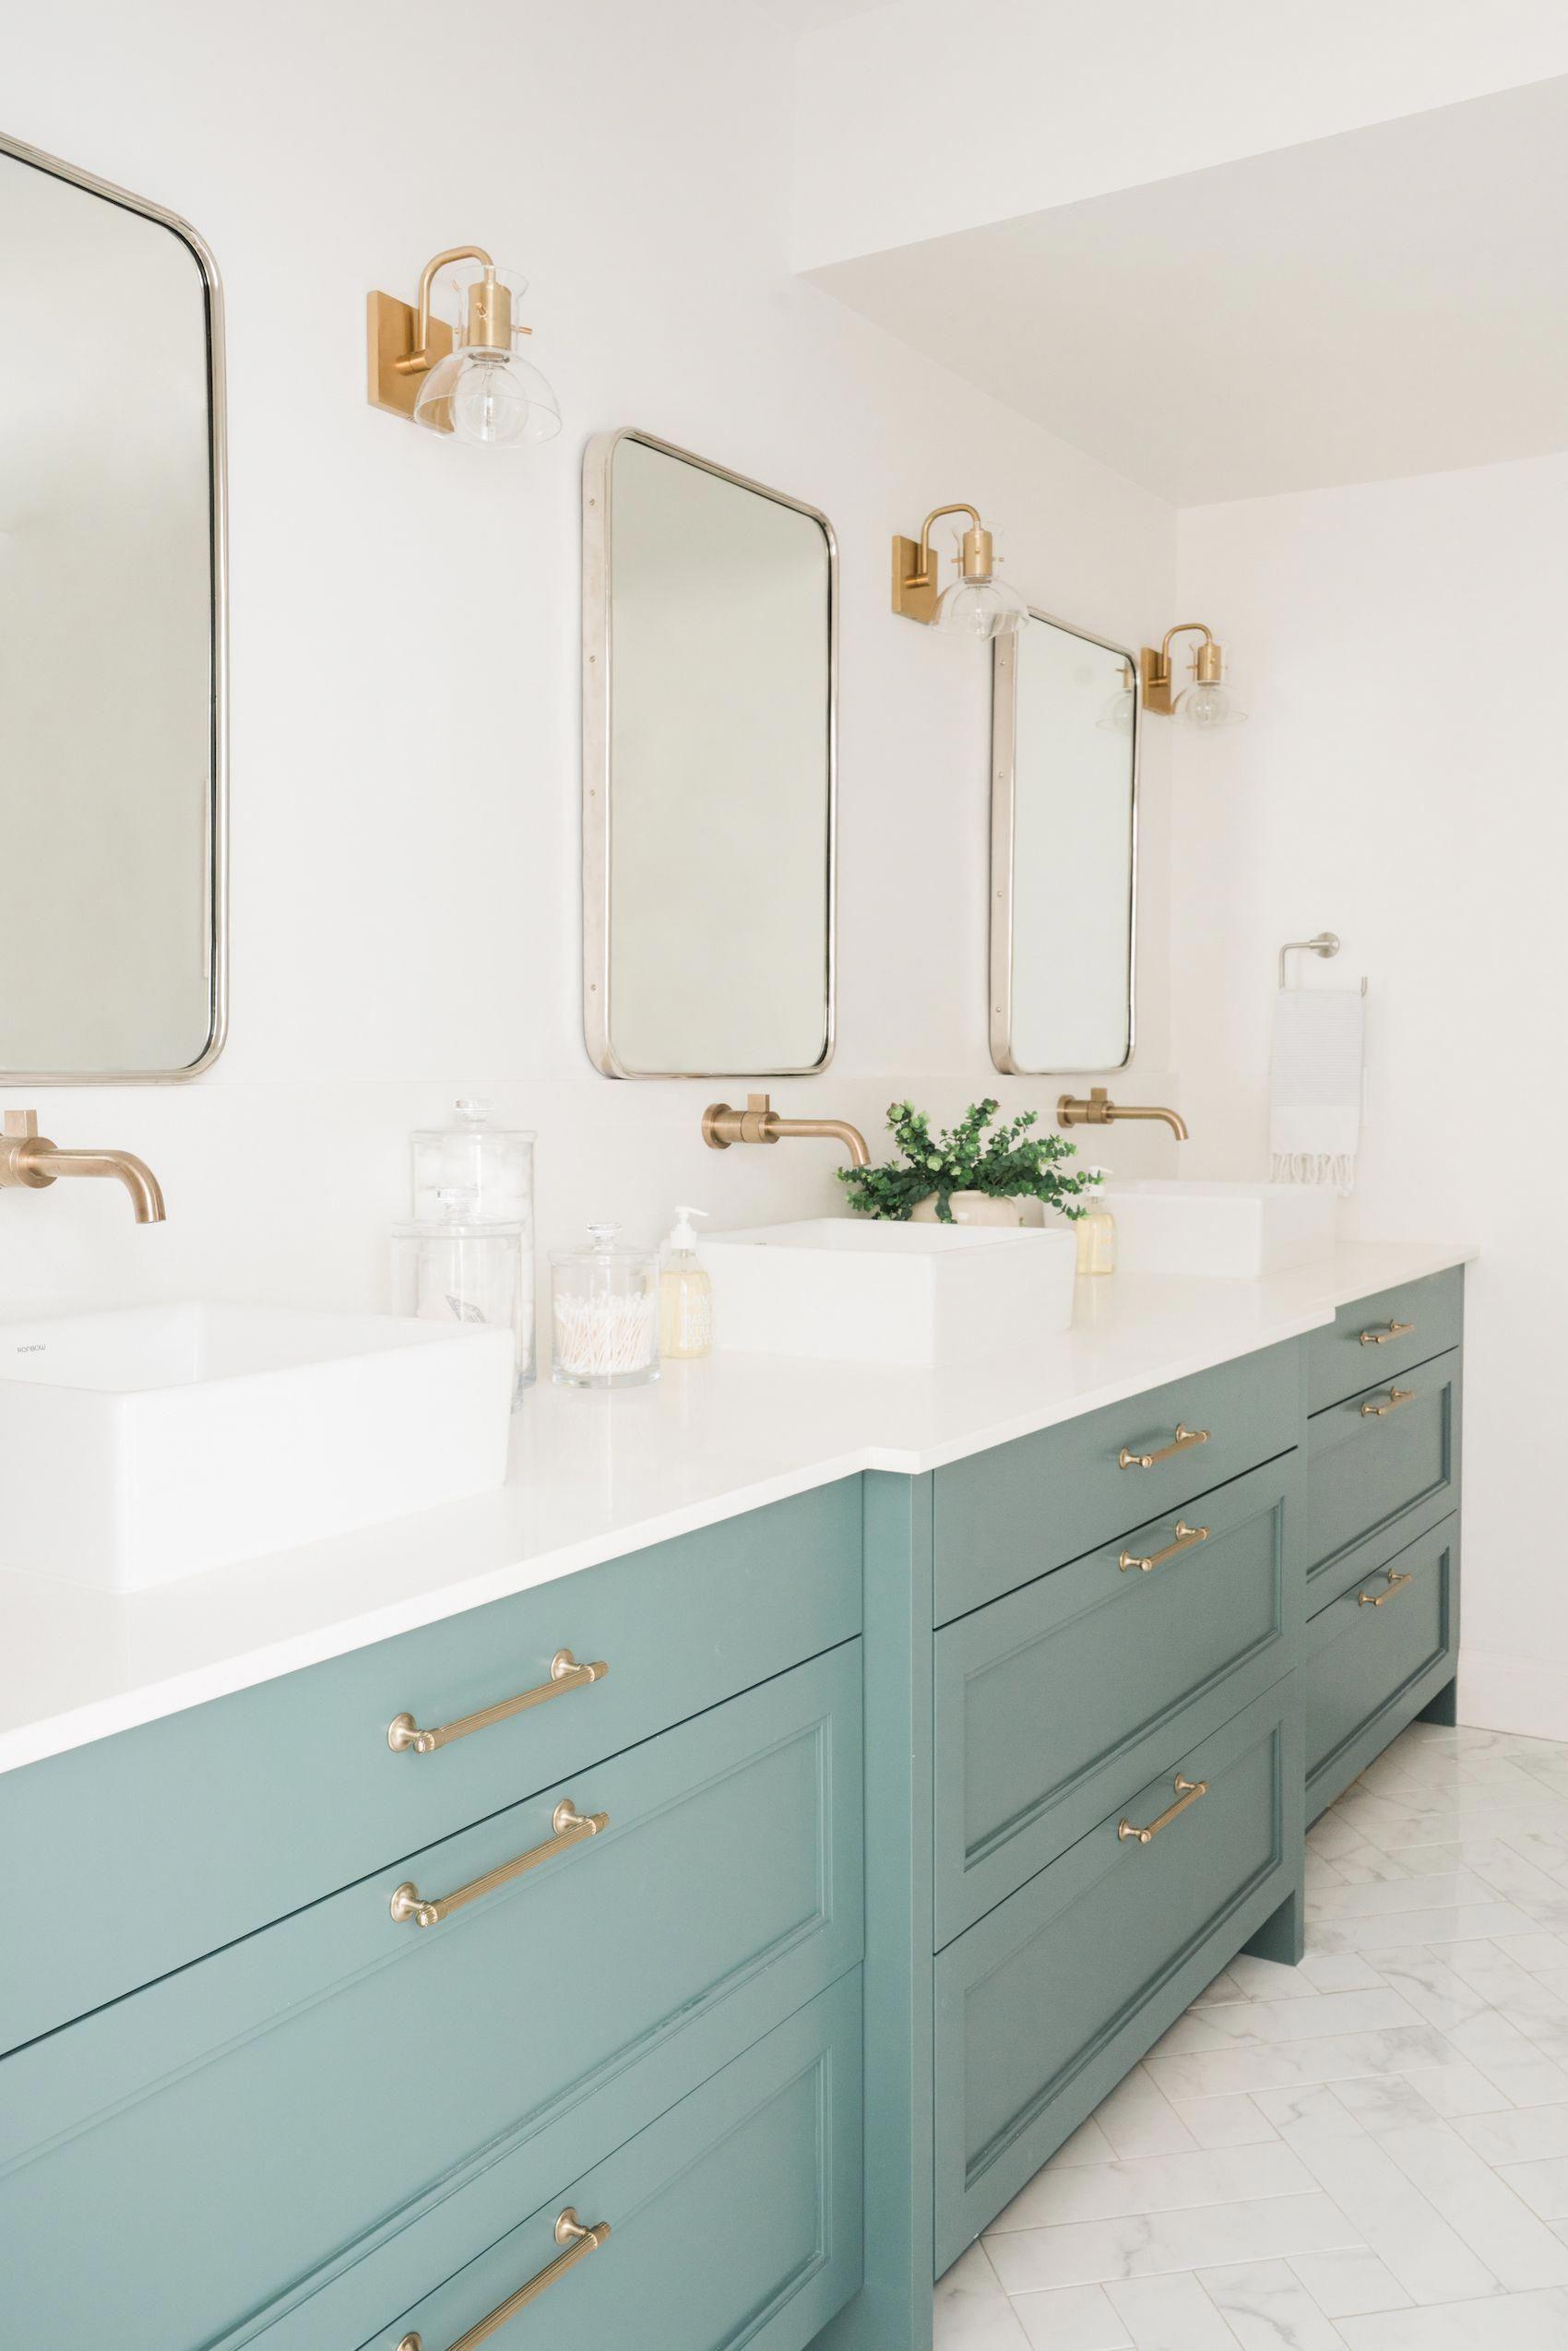 Cabinet Paint Color Is Benjamin Moore Jack Pine Green Bathroom Bathroom Cabinets Designs Mint Green Bathrooms